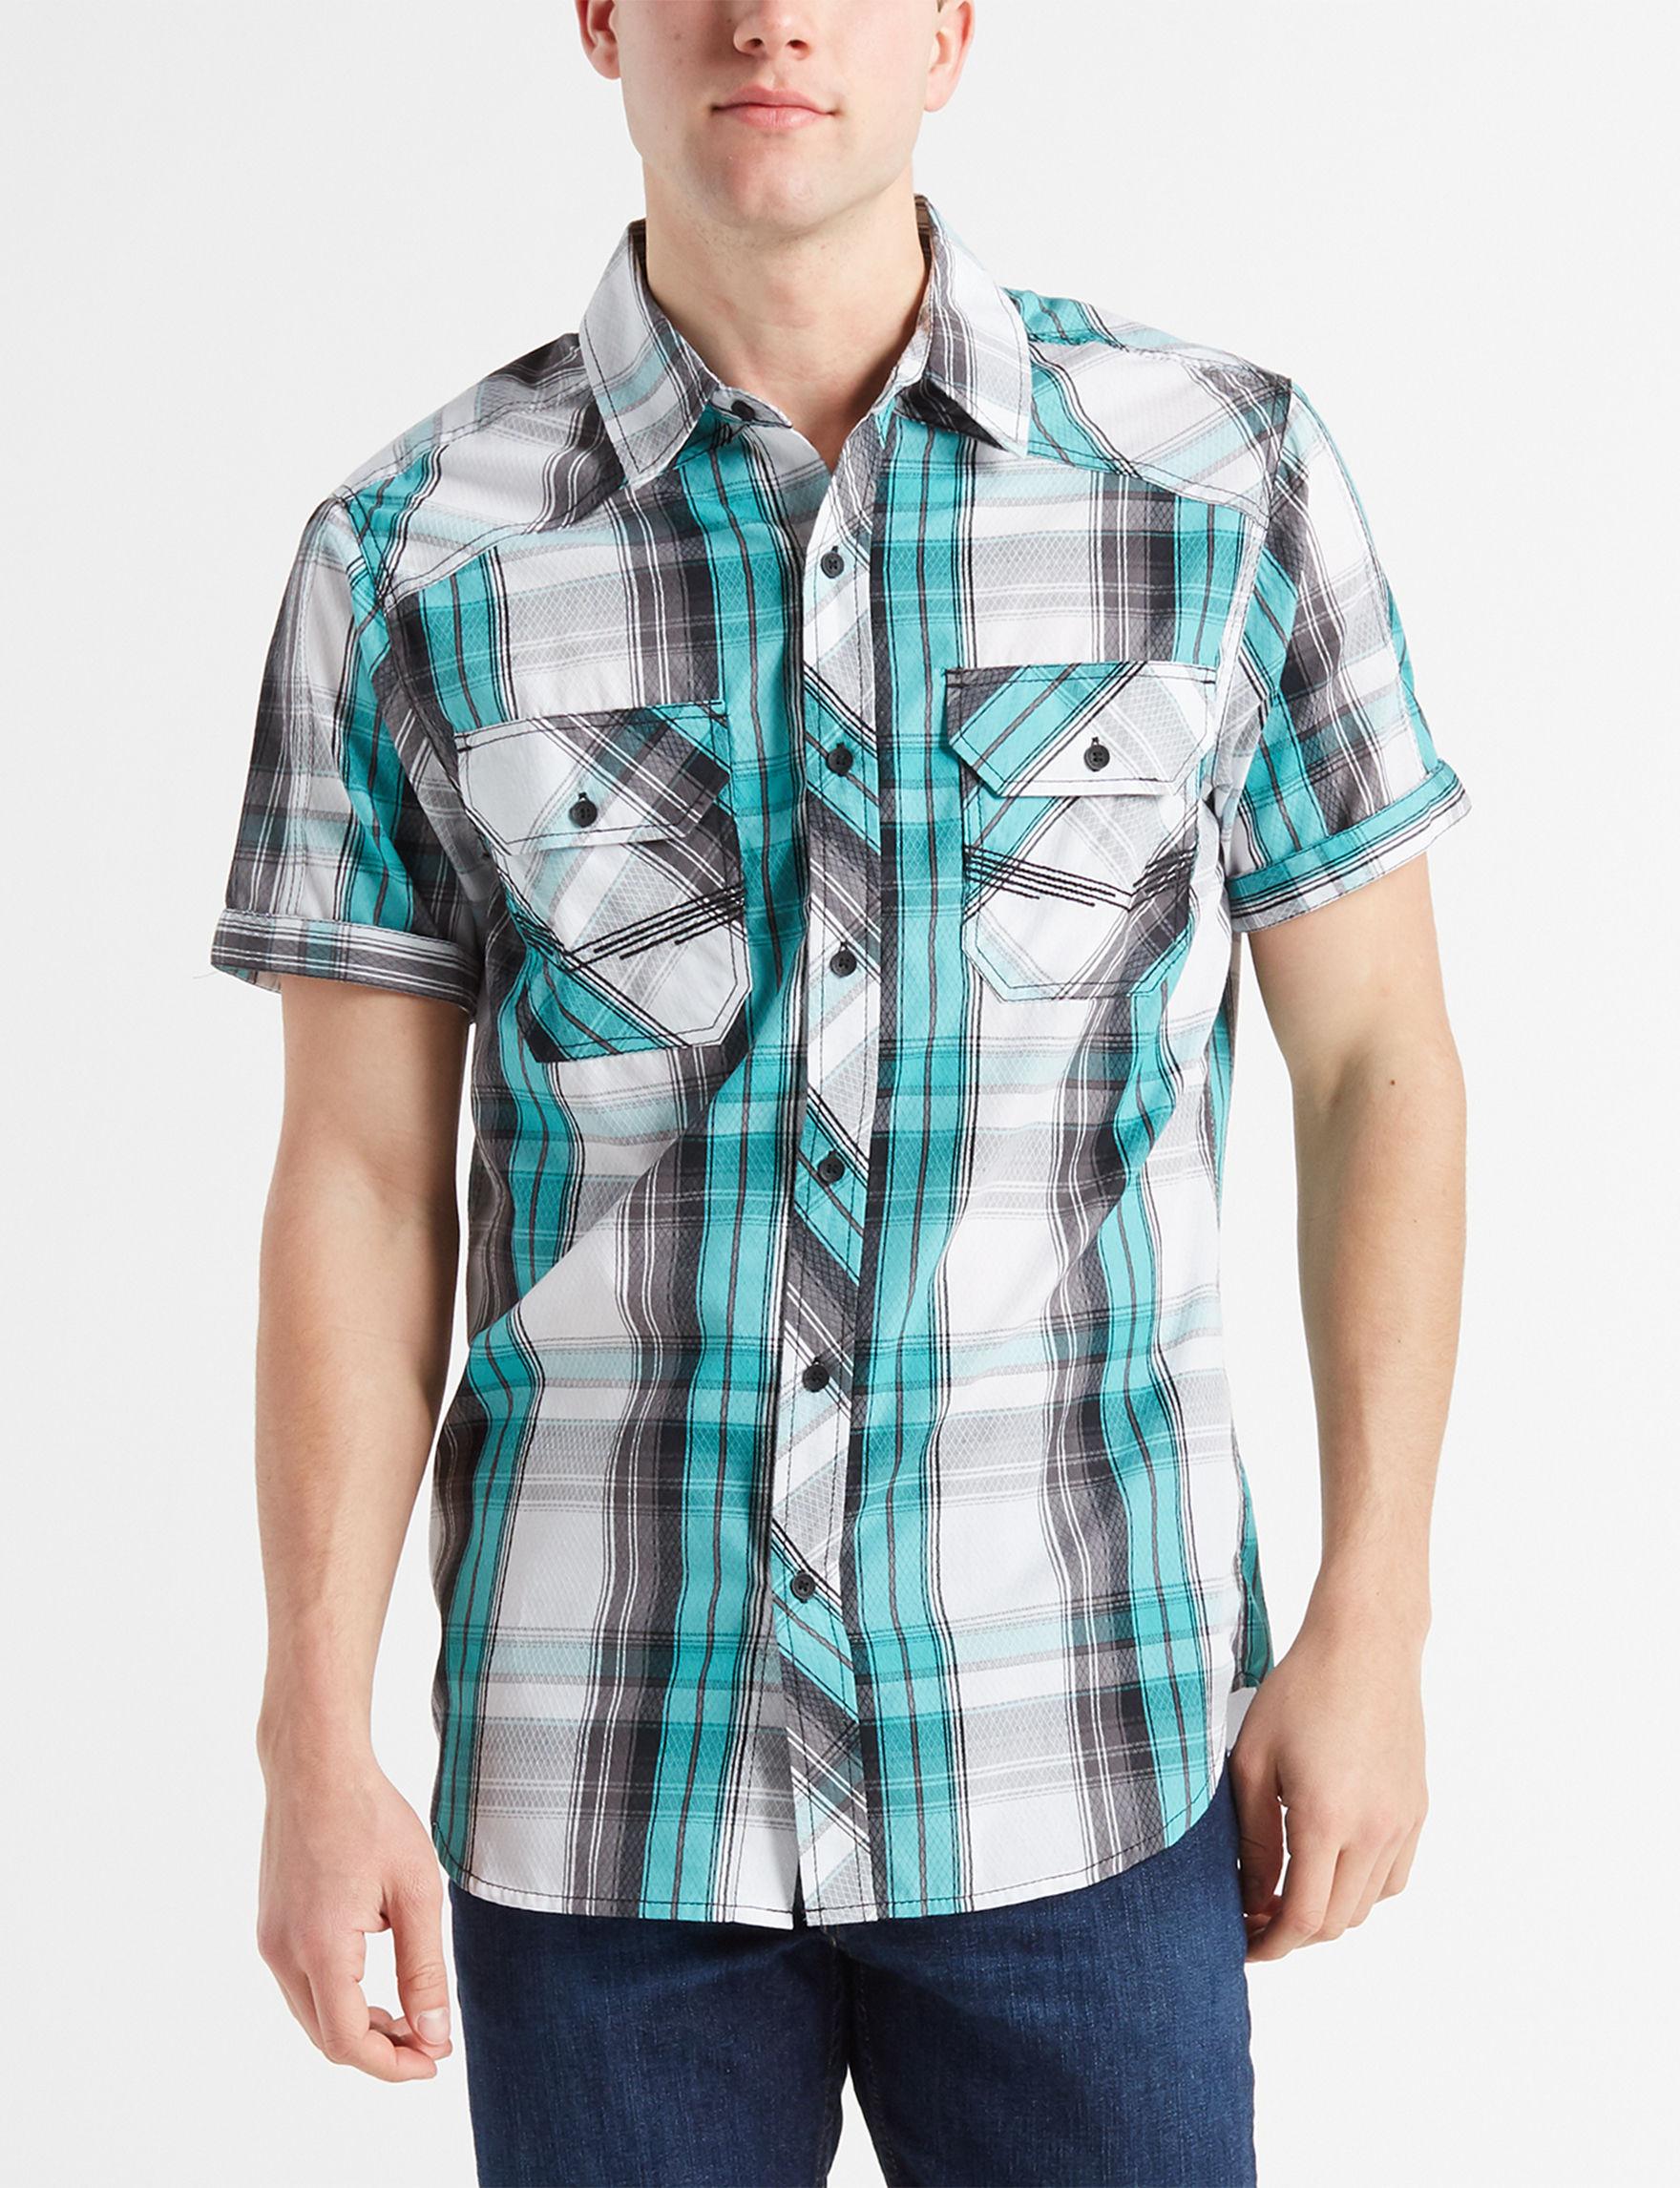 Surplus Teal Plaid Casual Button Down Shirts